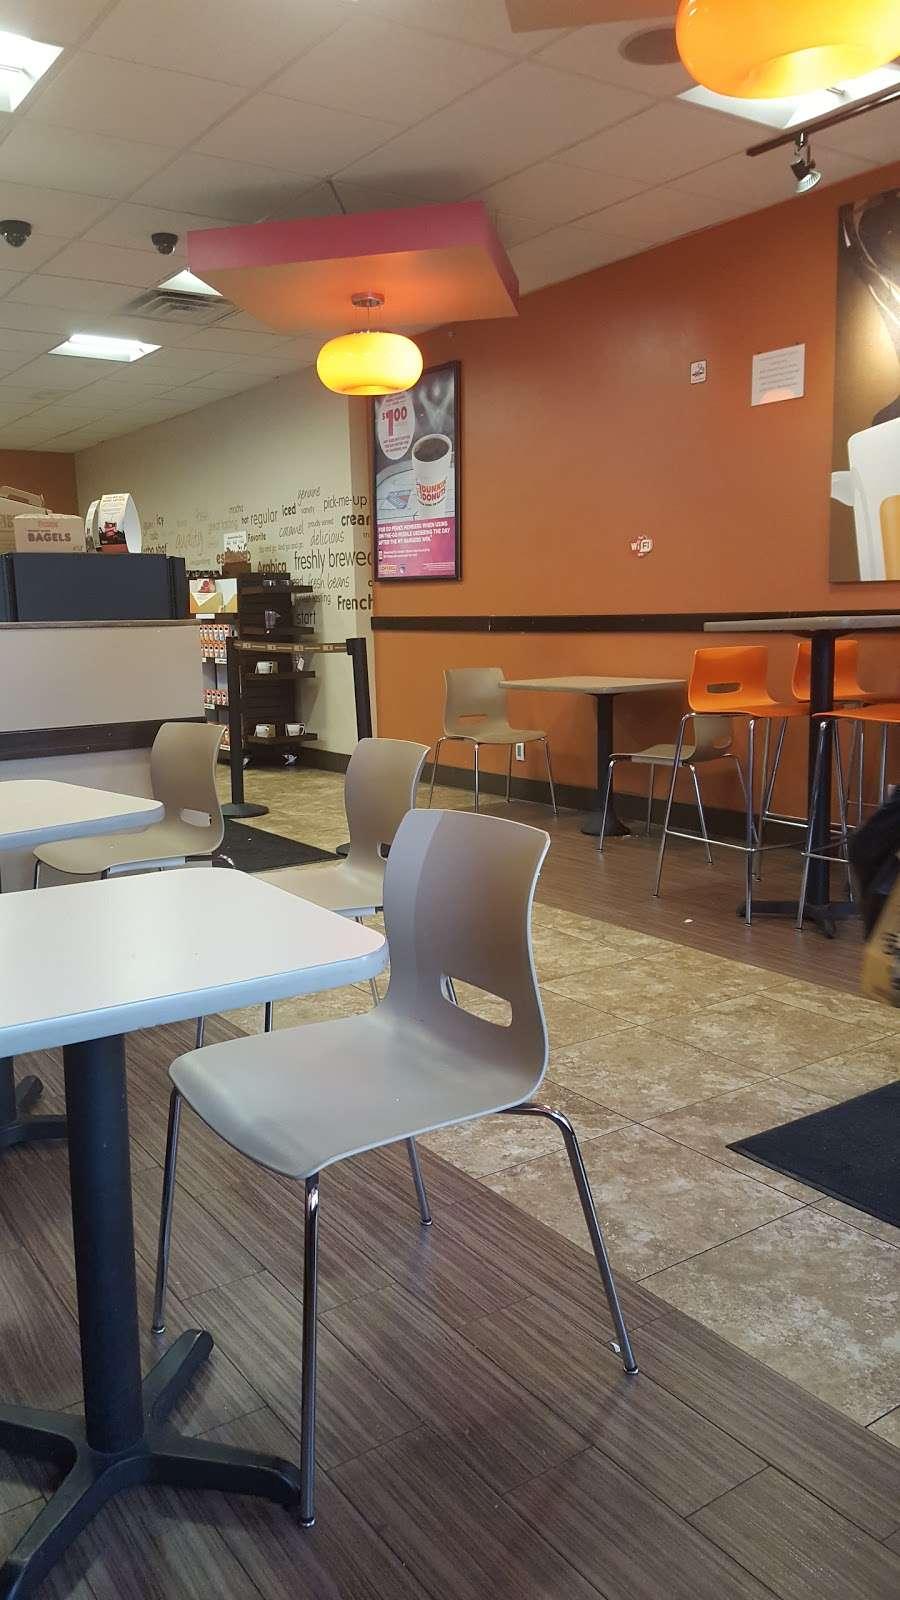 Dunkin Donuts - cafe  | Photo 6 of 10 | Address: 122-17 Liberty Ave, South Richmond Hill, NY 11419, USA | Phone: (718) 848-4874